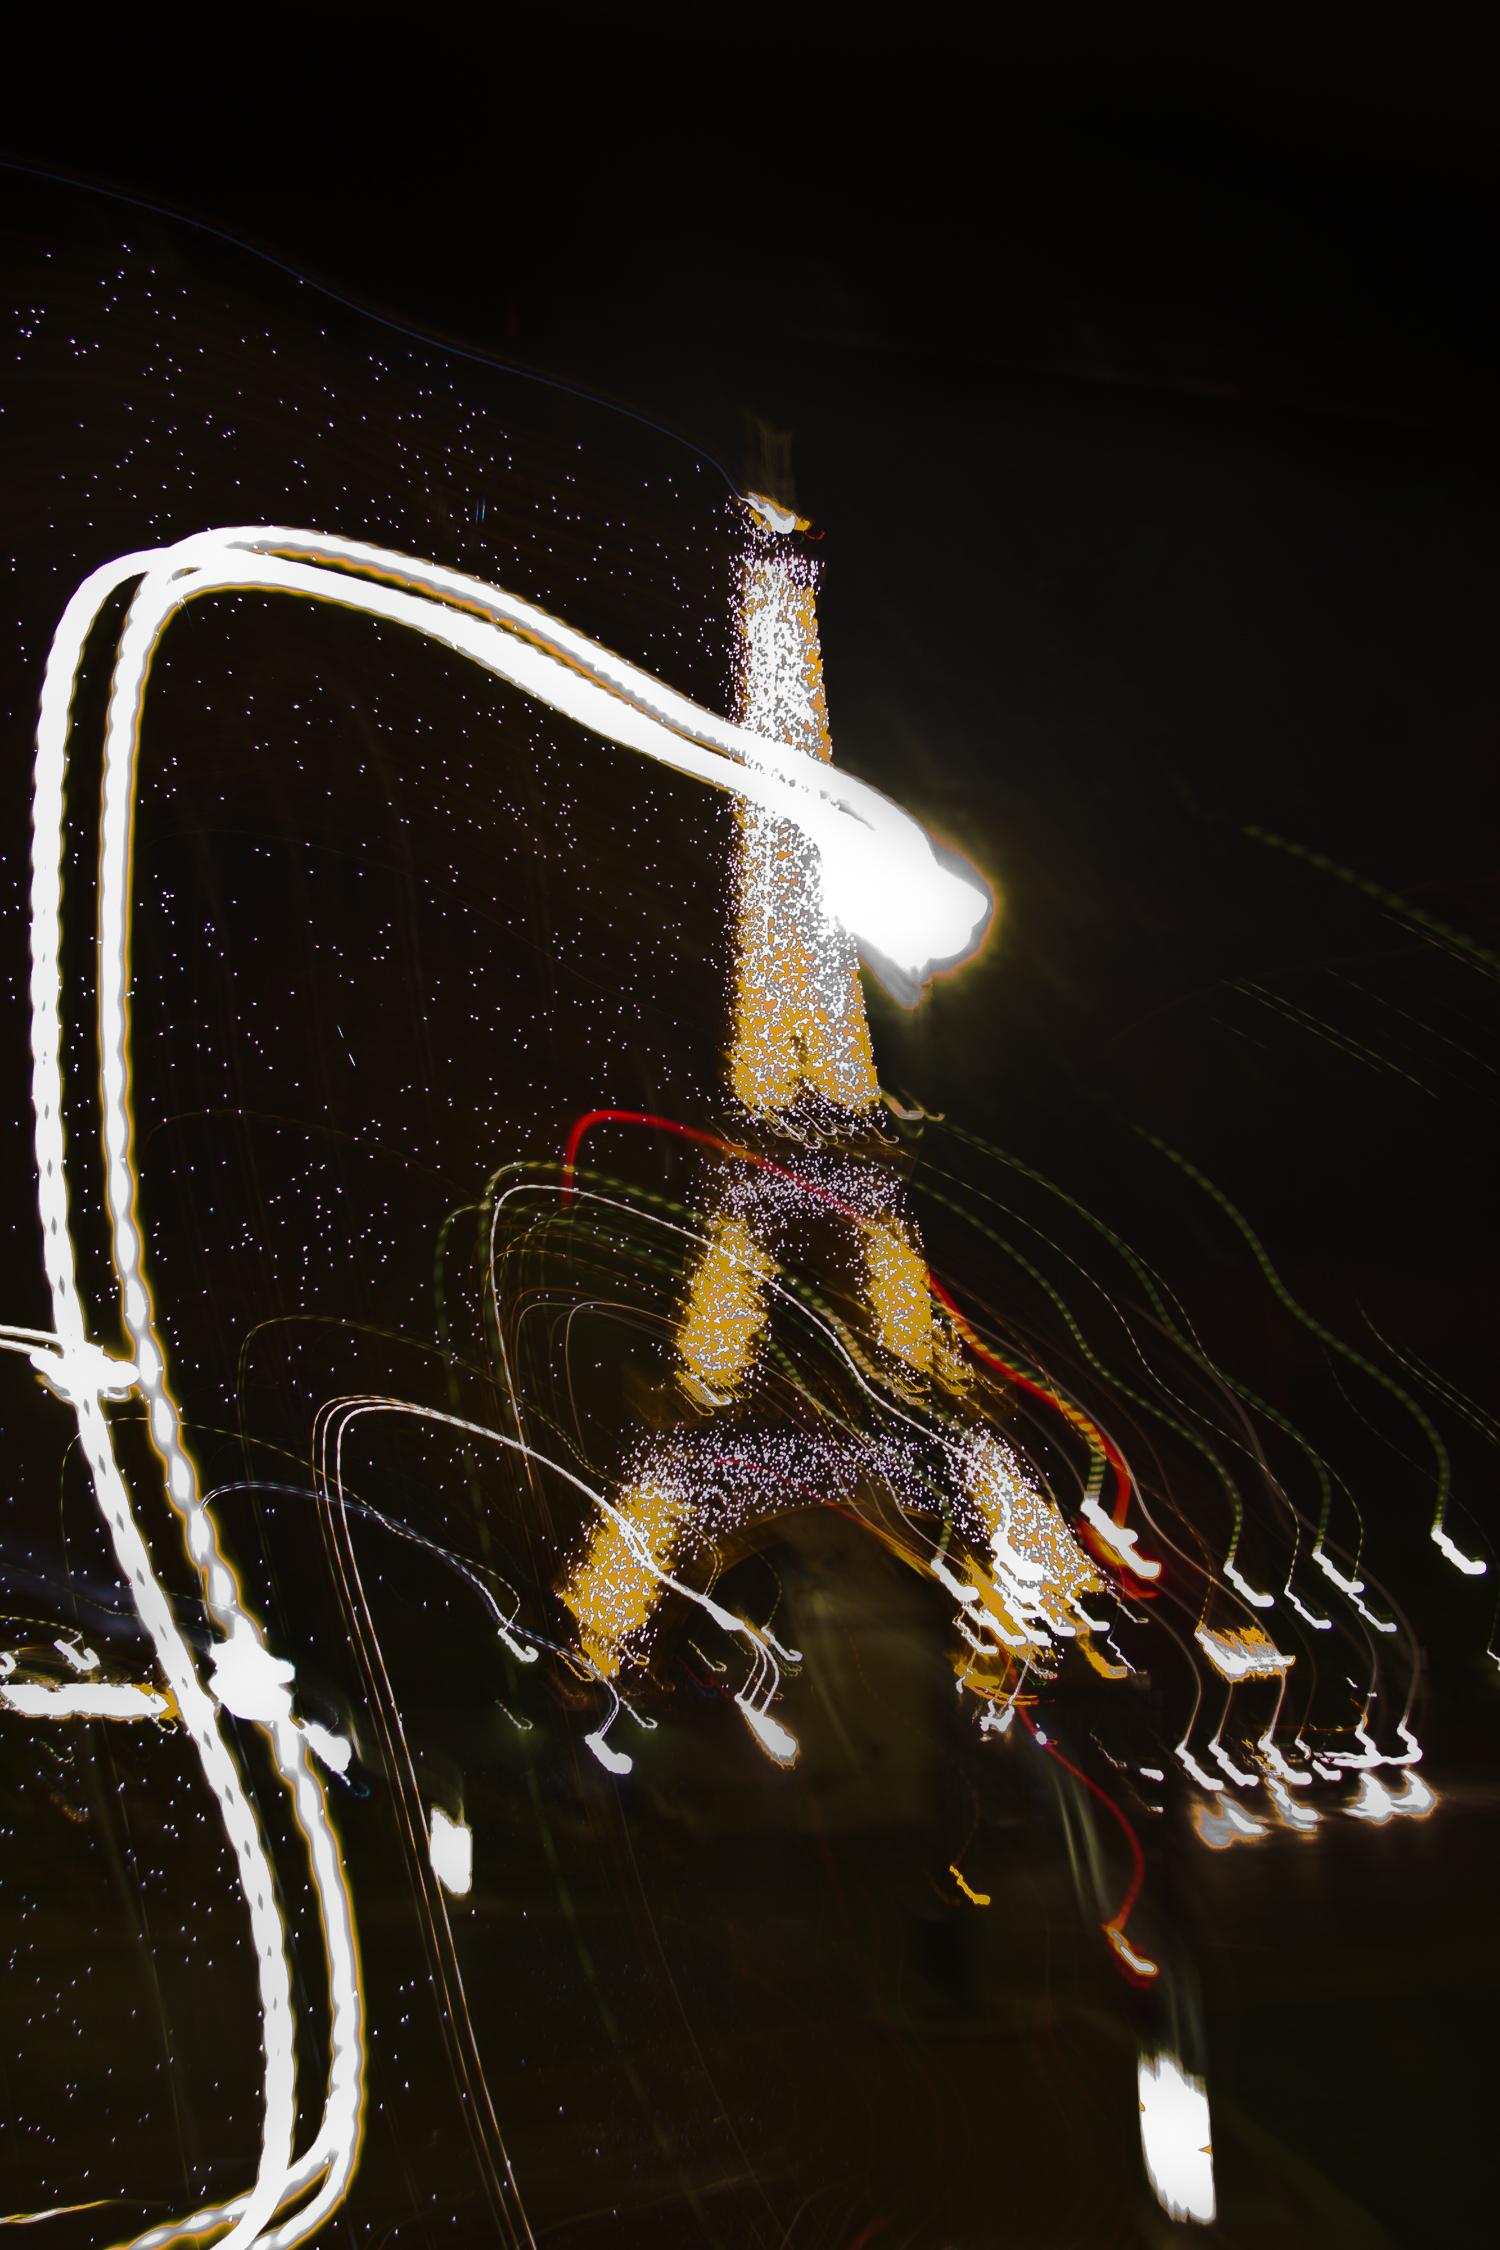 20070707_paris_049.jpg